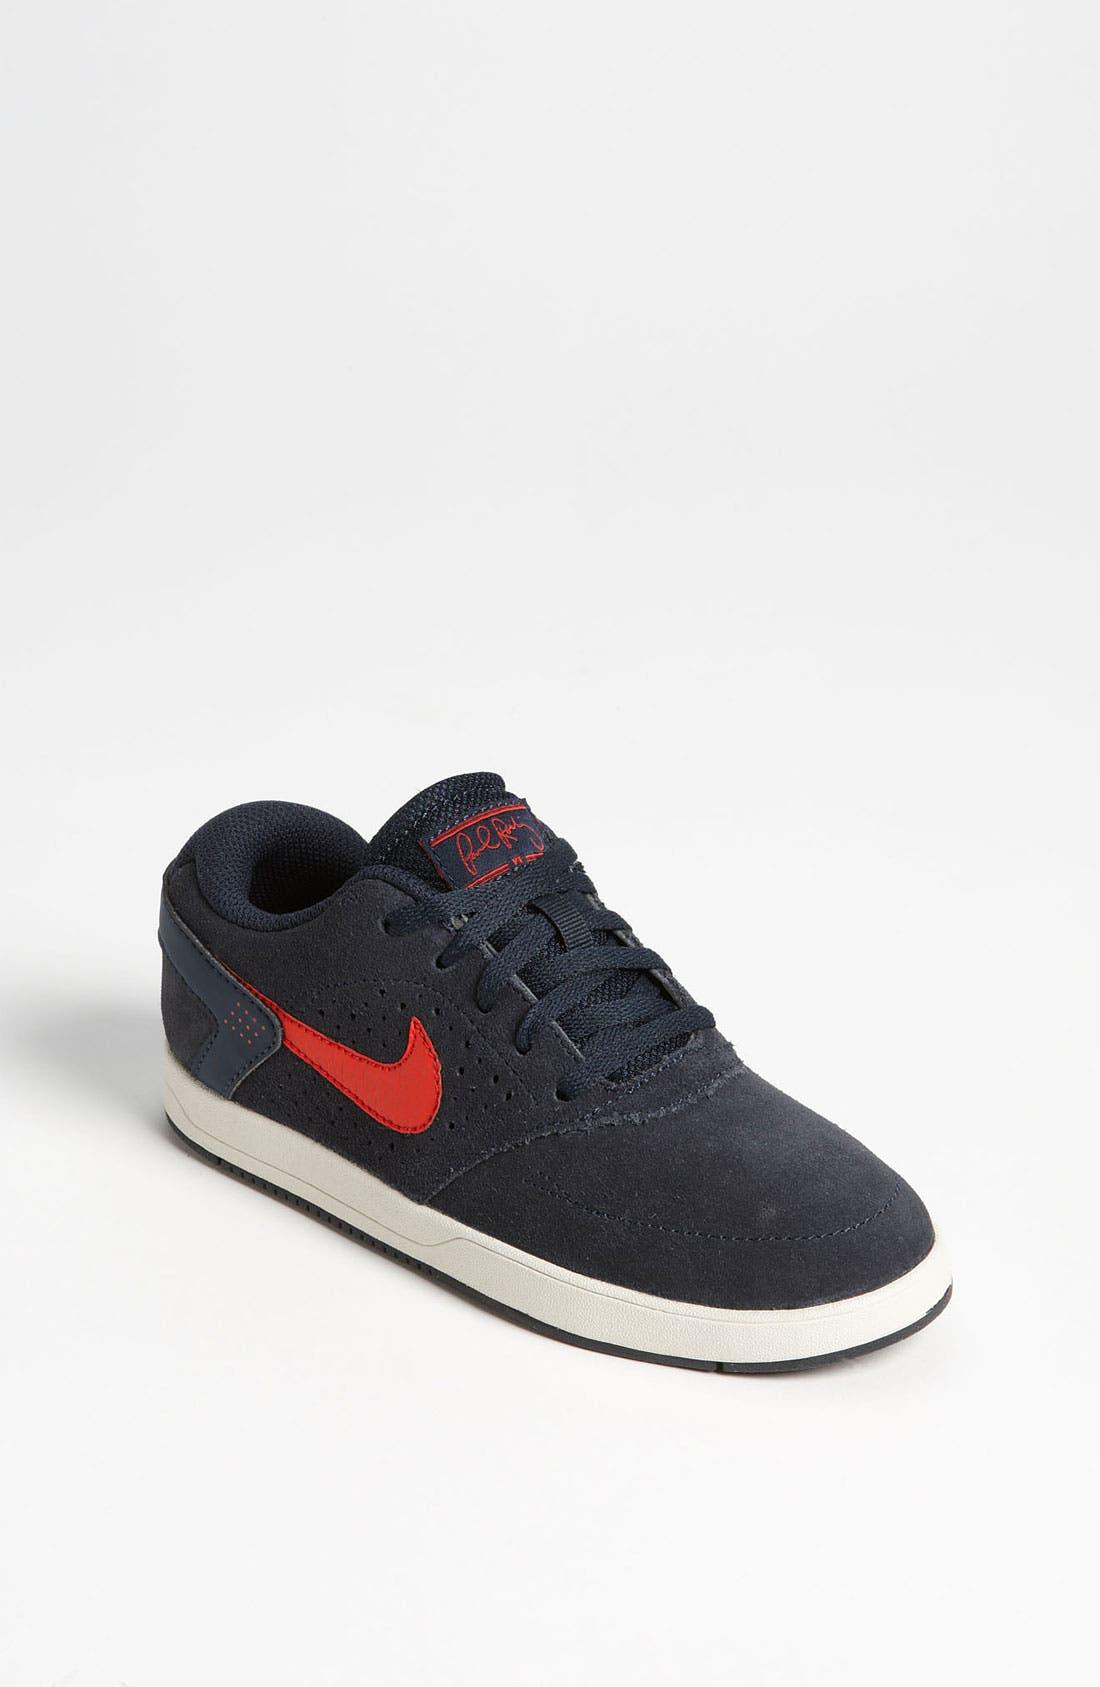 Alternate Image 1 Selected - Nike 'Paul Rodriguez 6' Sneaker (Toddler, Little Kid & Big Kid)